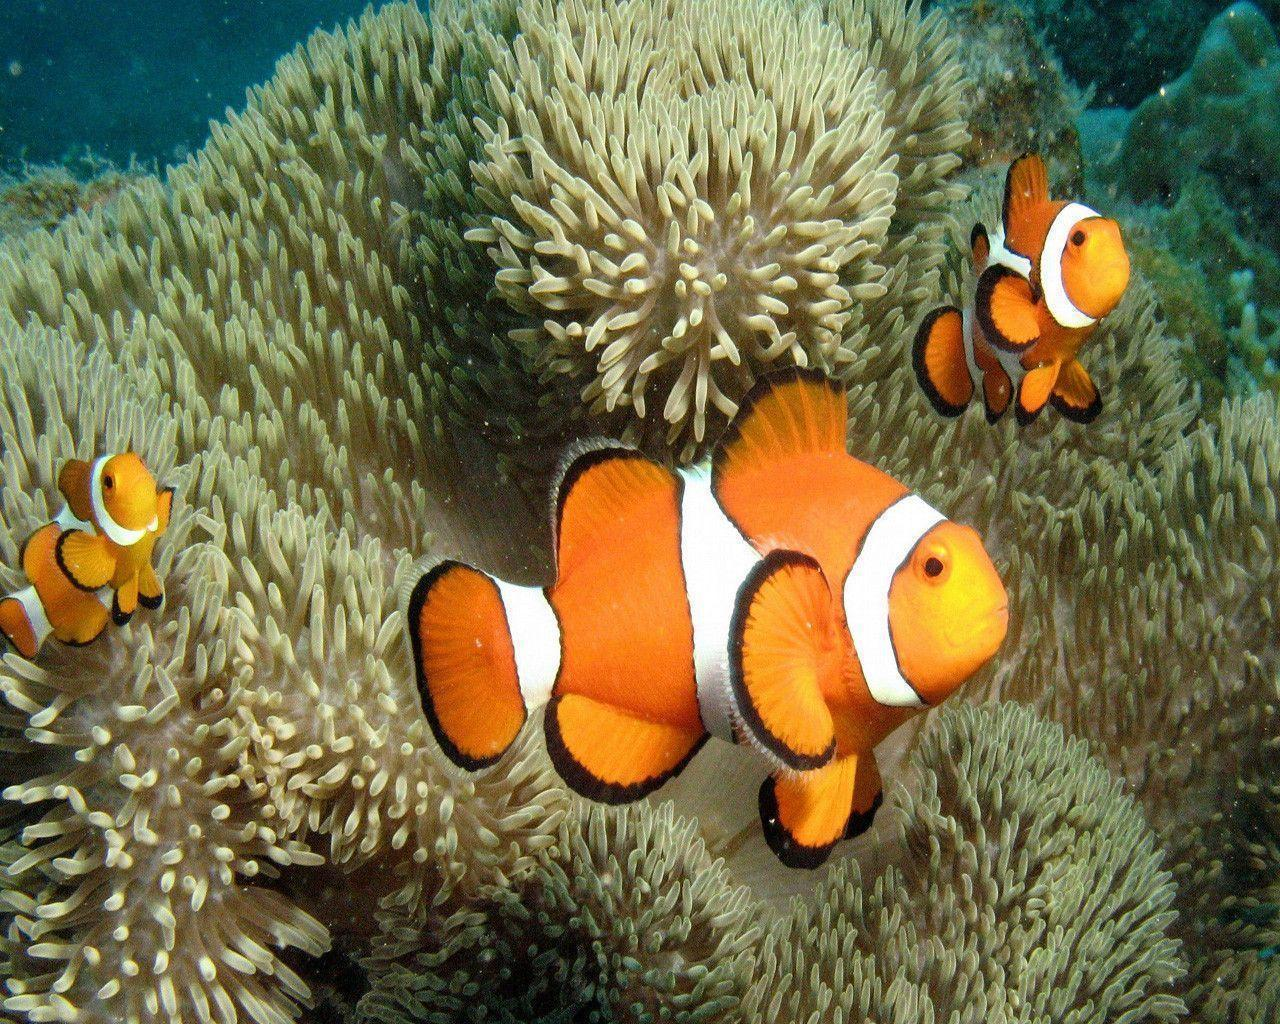 wallpaper clarkii clownfish - photo #26